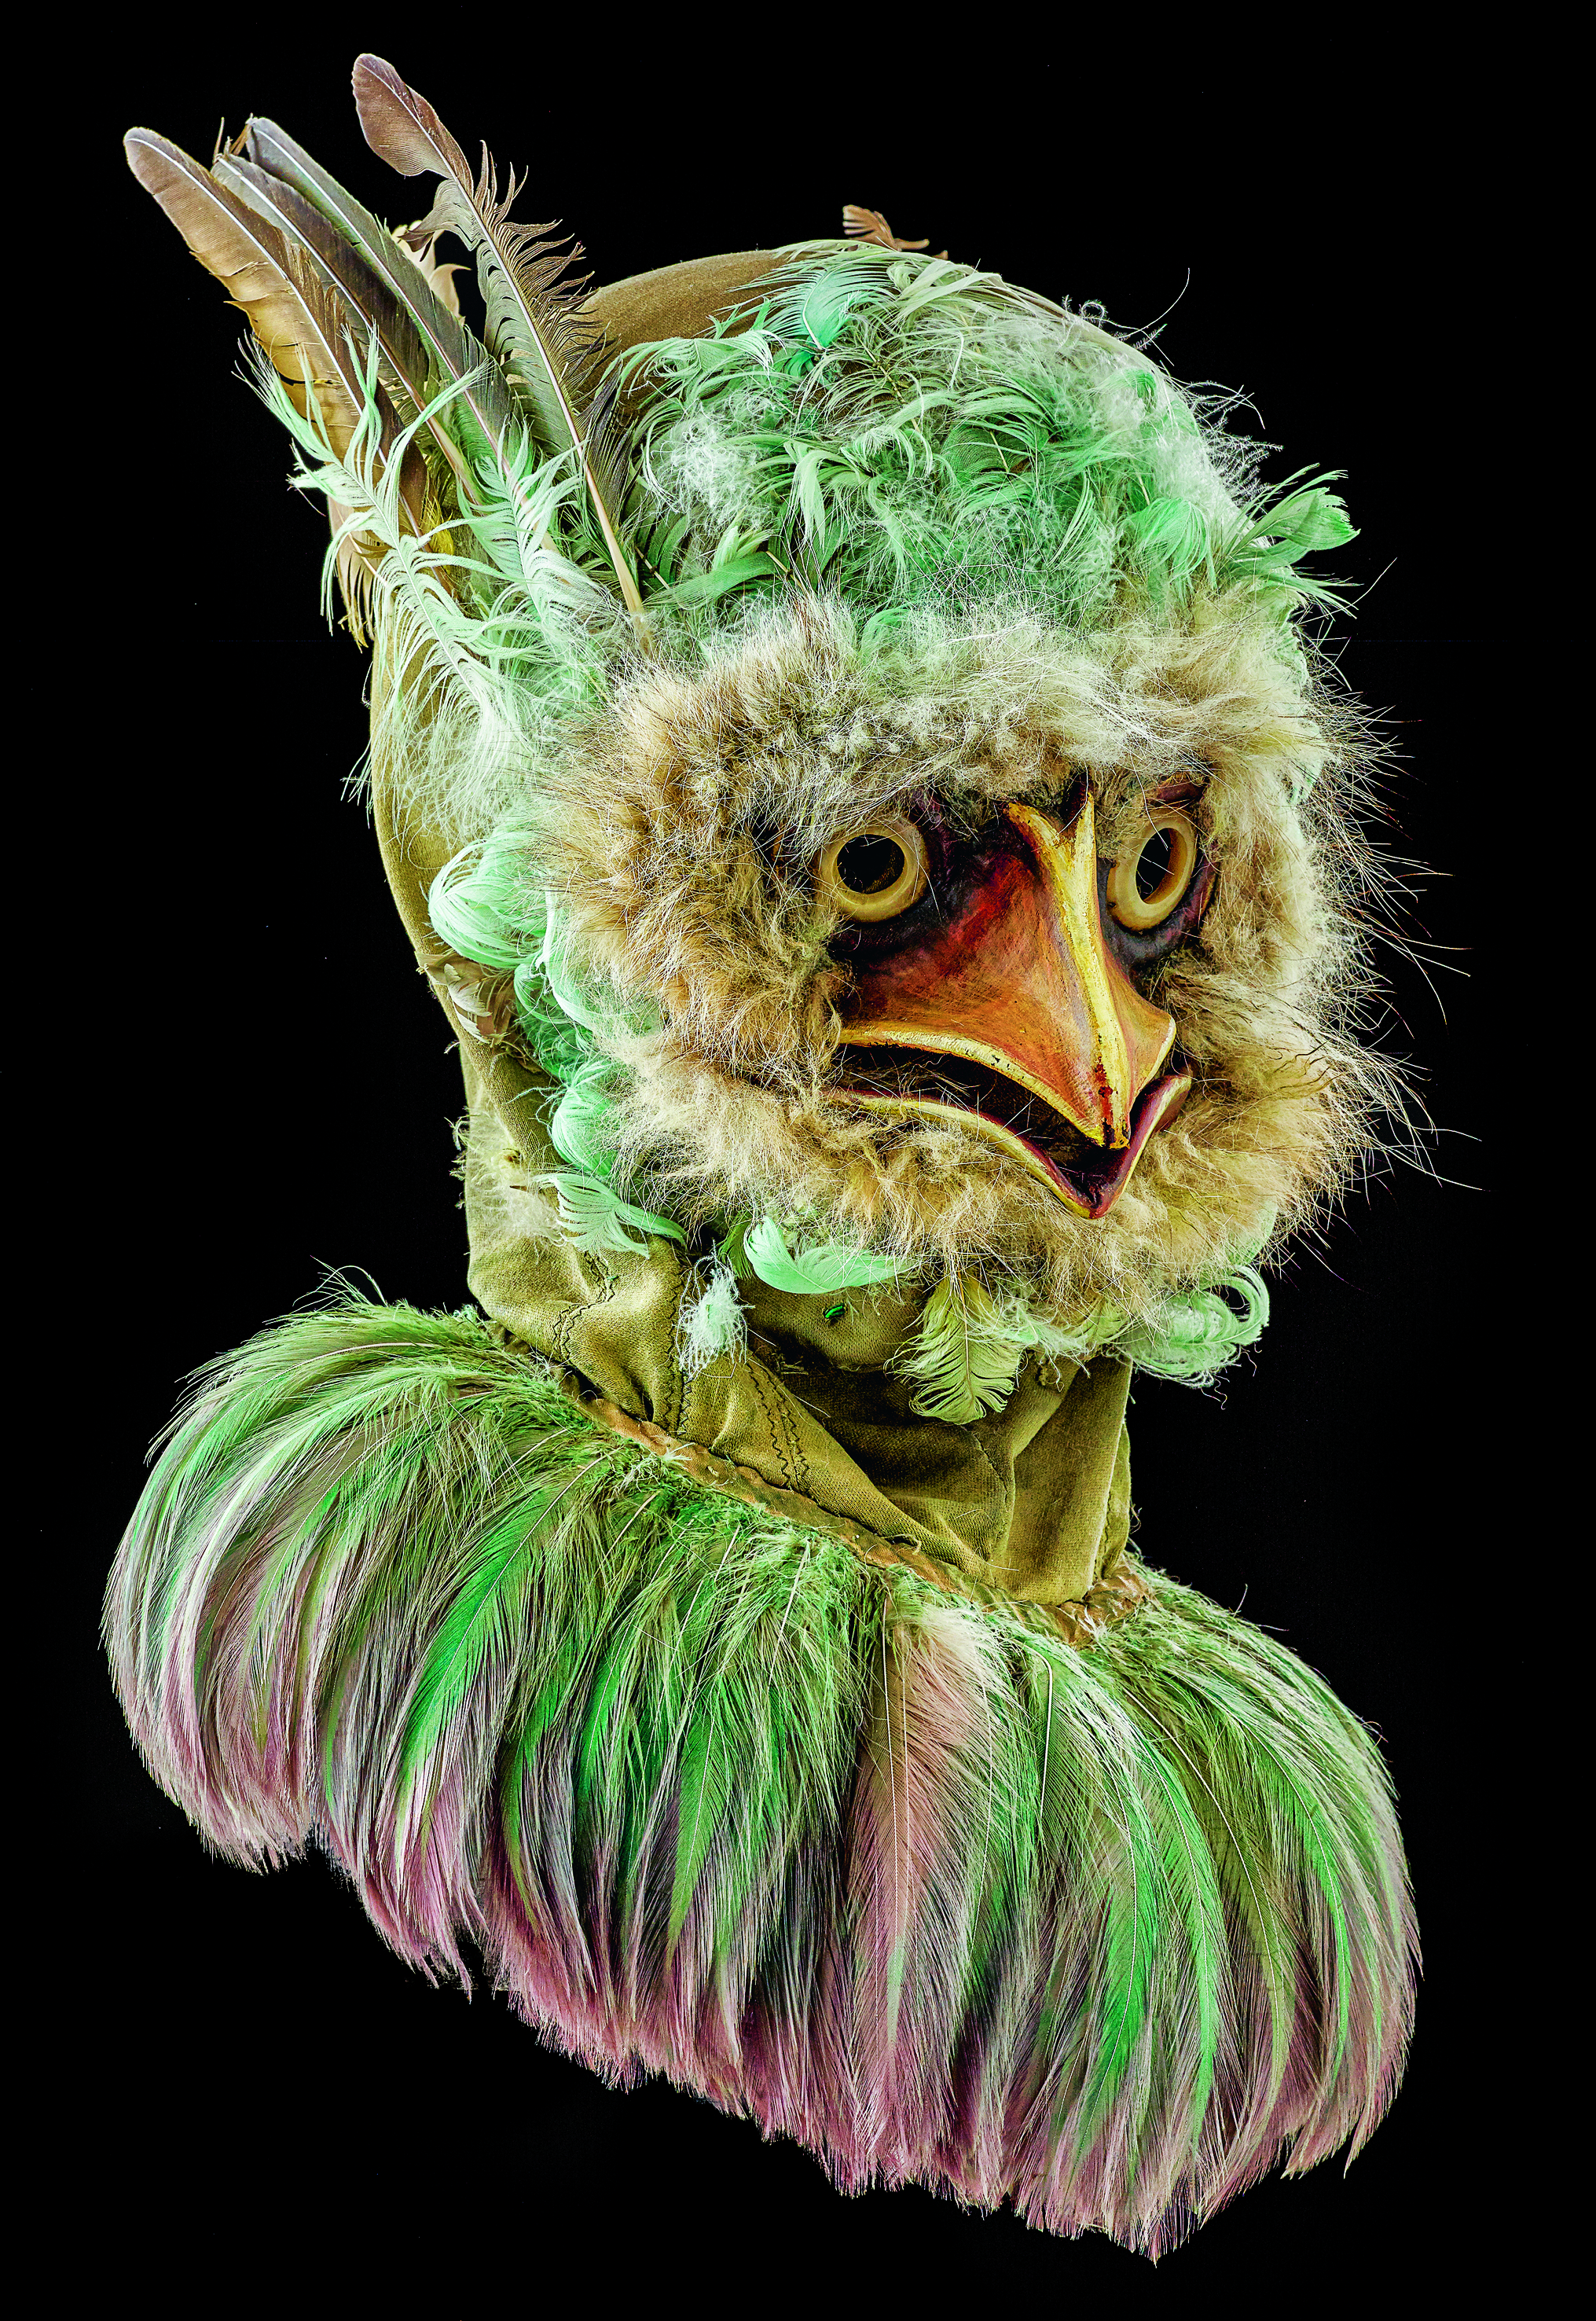 L'Oiseau vert